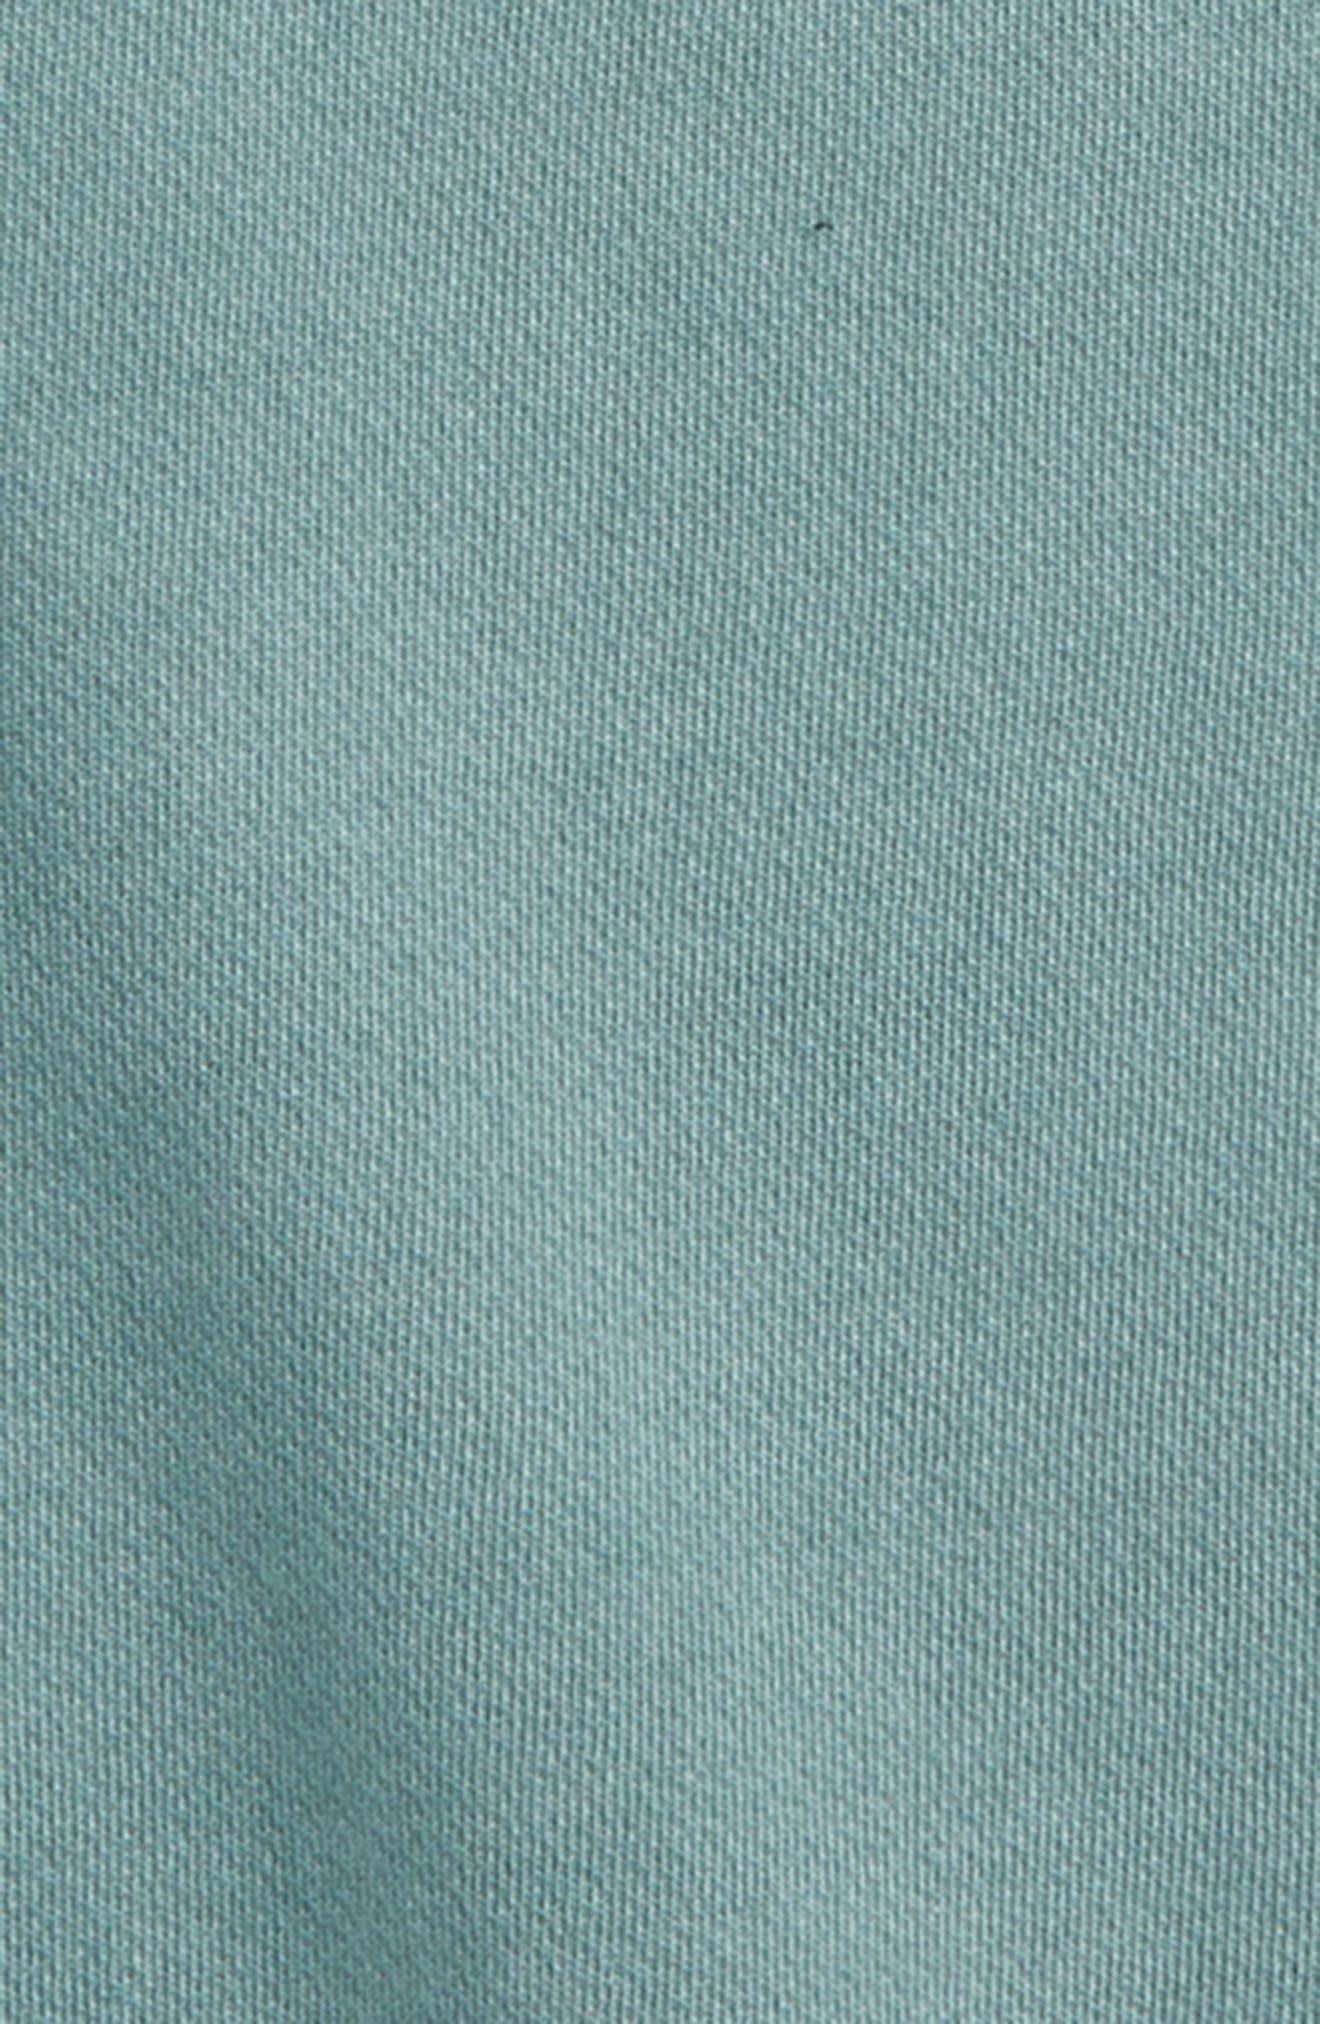 Washed Sweatshirt,                             Alternate thumbnail 2, color,                             445